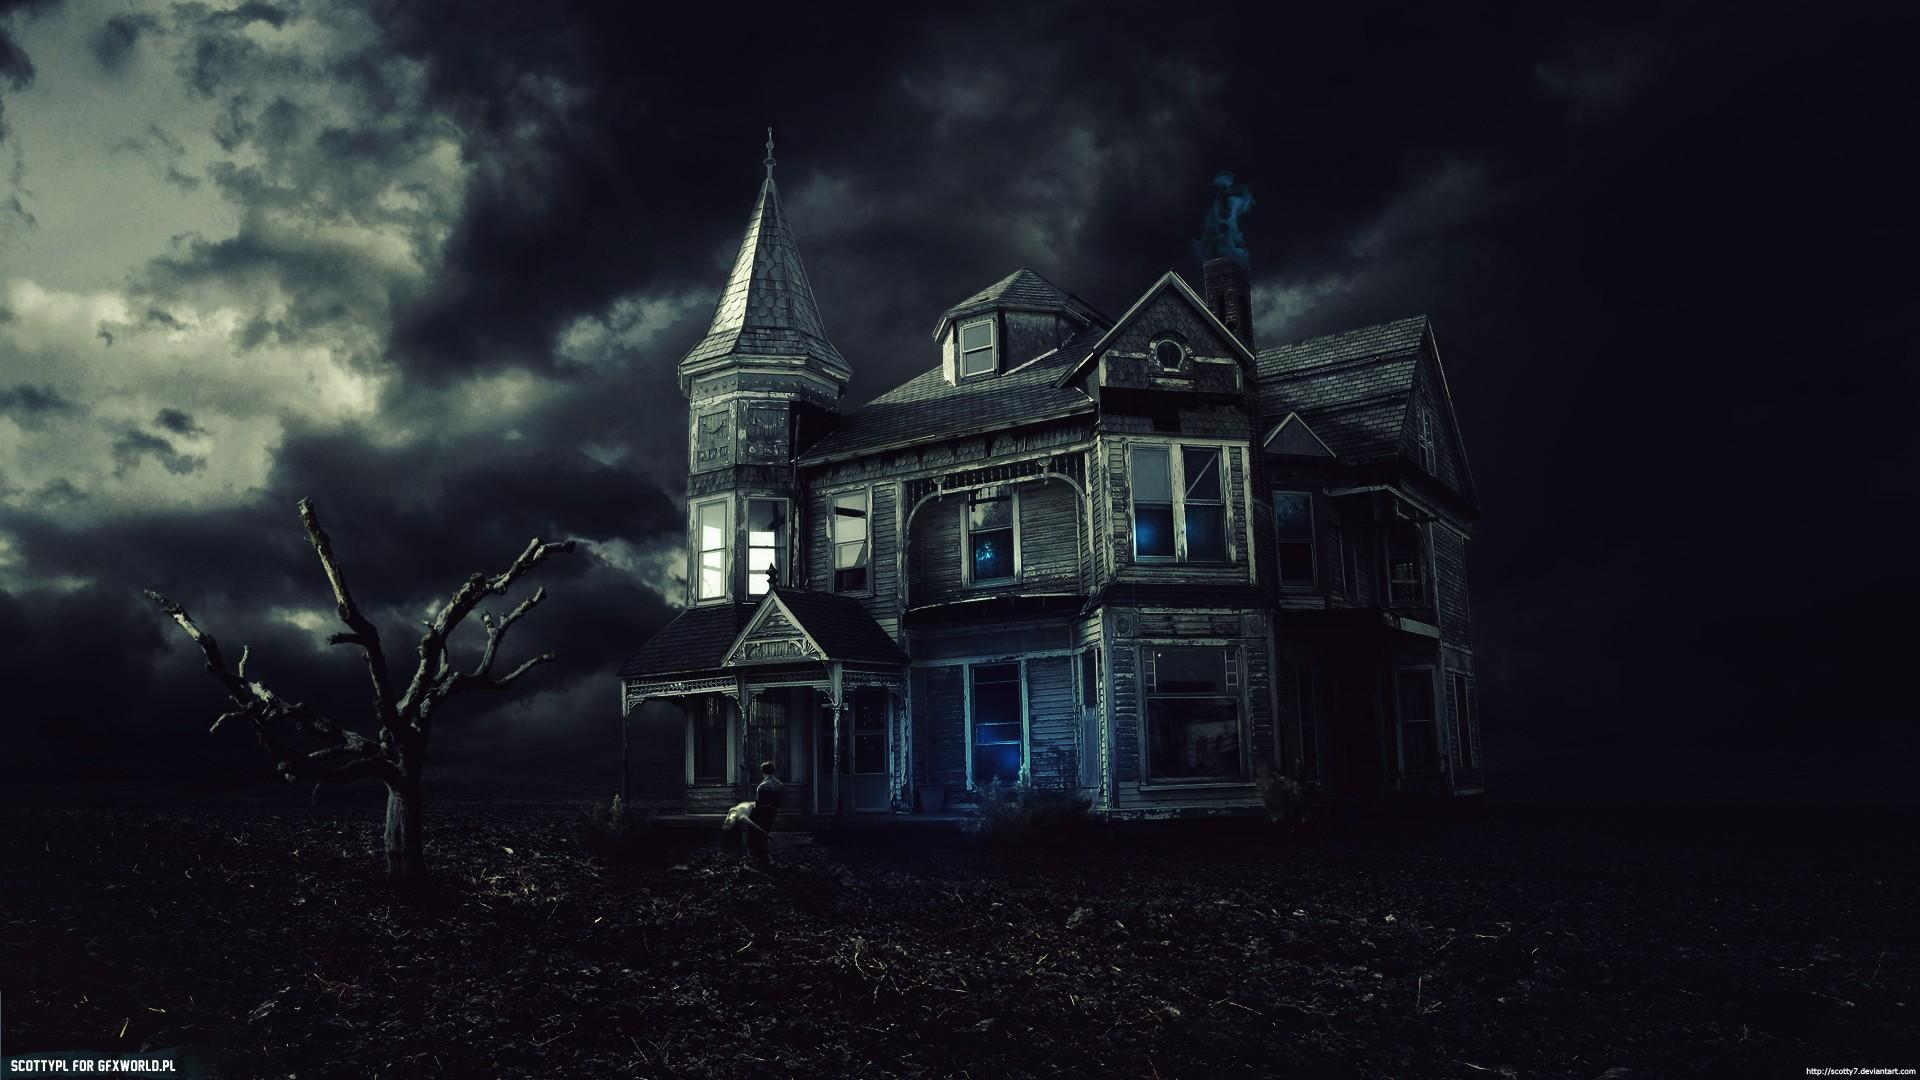 haunted house wallpapers wallpapersafari. Black Bedroom Furniture Sets. Home Design Ideas